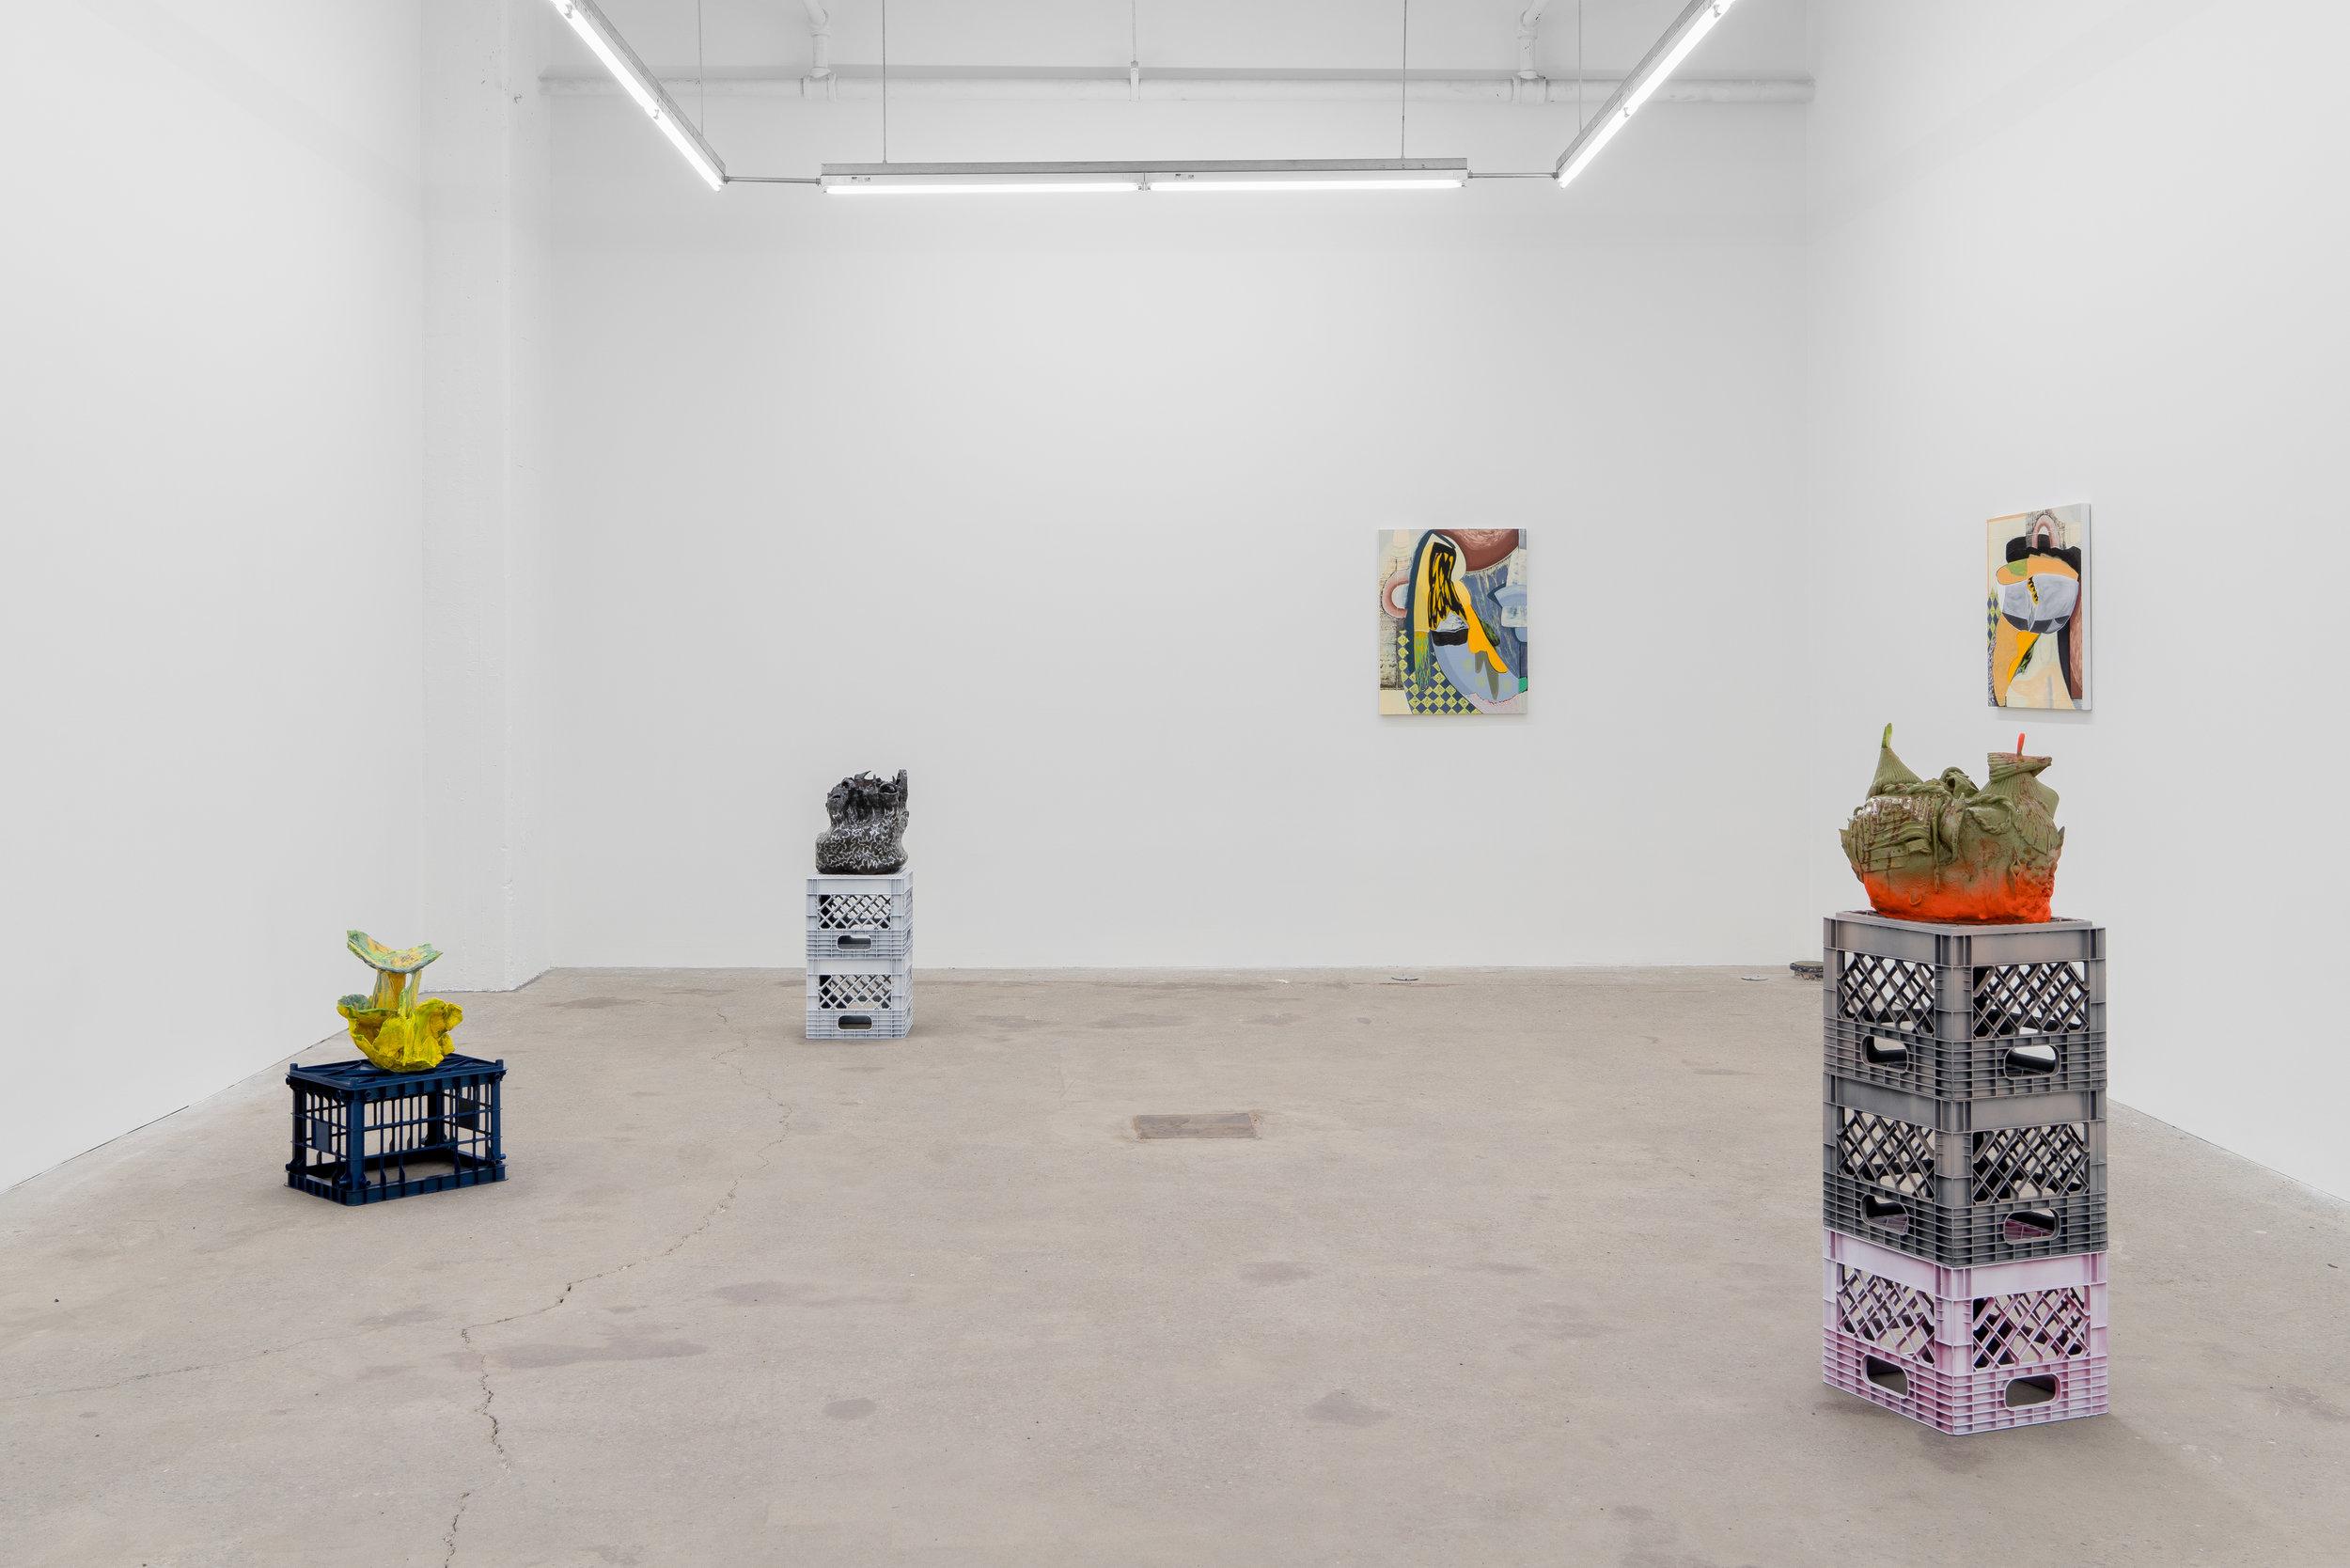 Magalie Guérin & Philippe Caron Lefebvre, 2019, exhibition view, Galerie Nicolas Robert, photo : Jean-Michael Seminaro